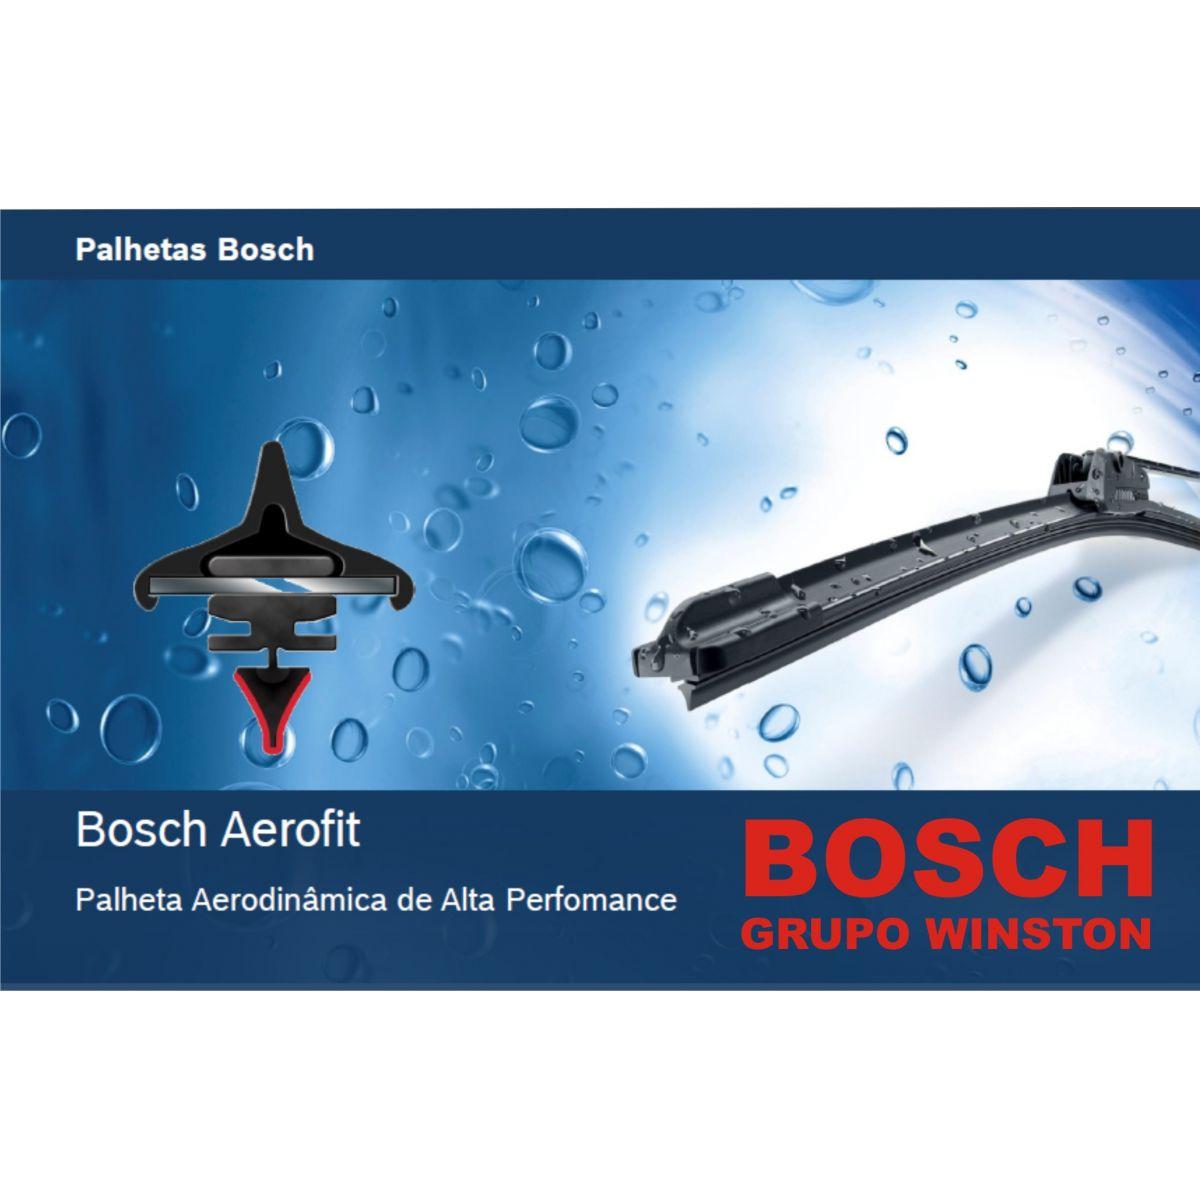 Palheta Bosch Aerofit Limpador de para brisa Bosch TOYOTA RAV4